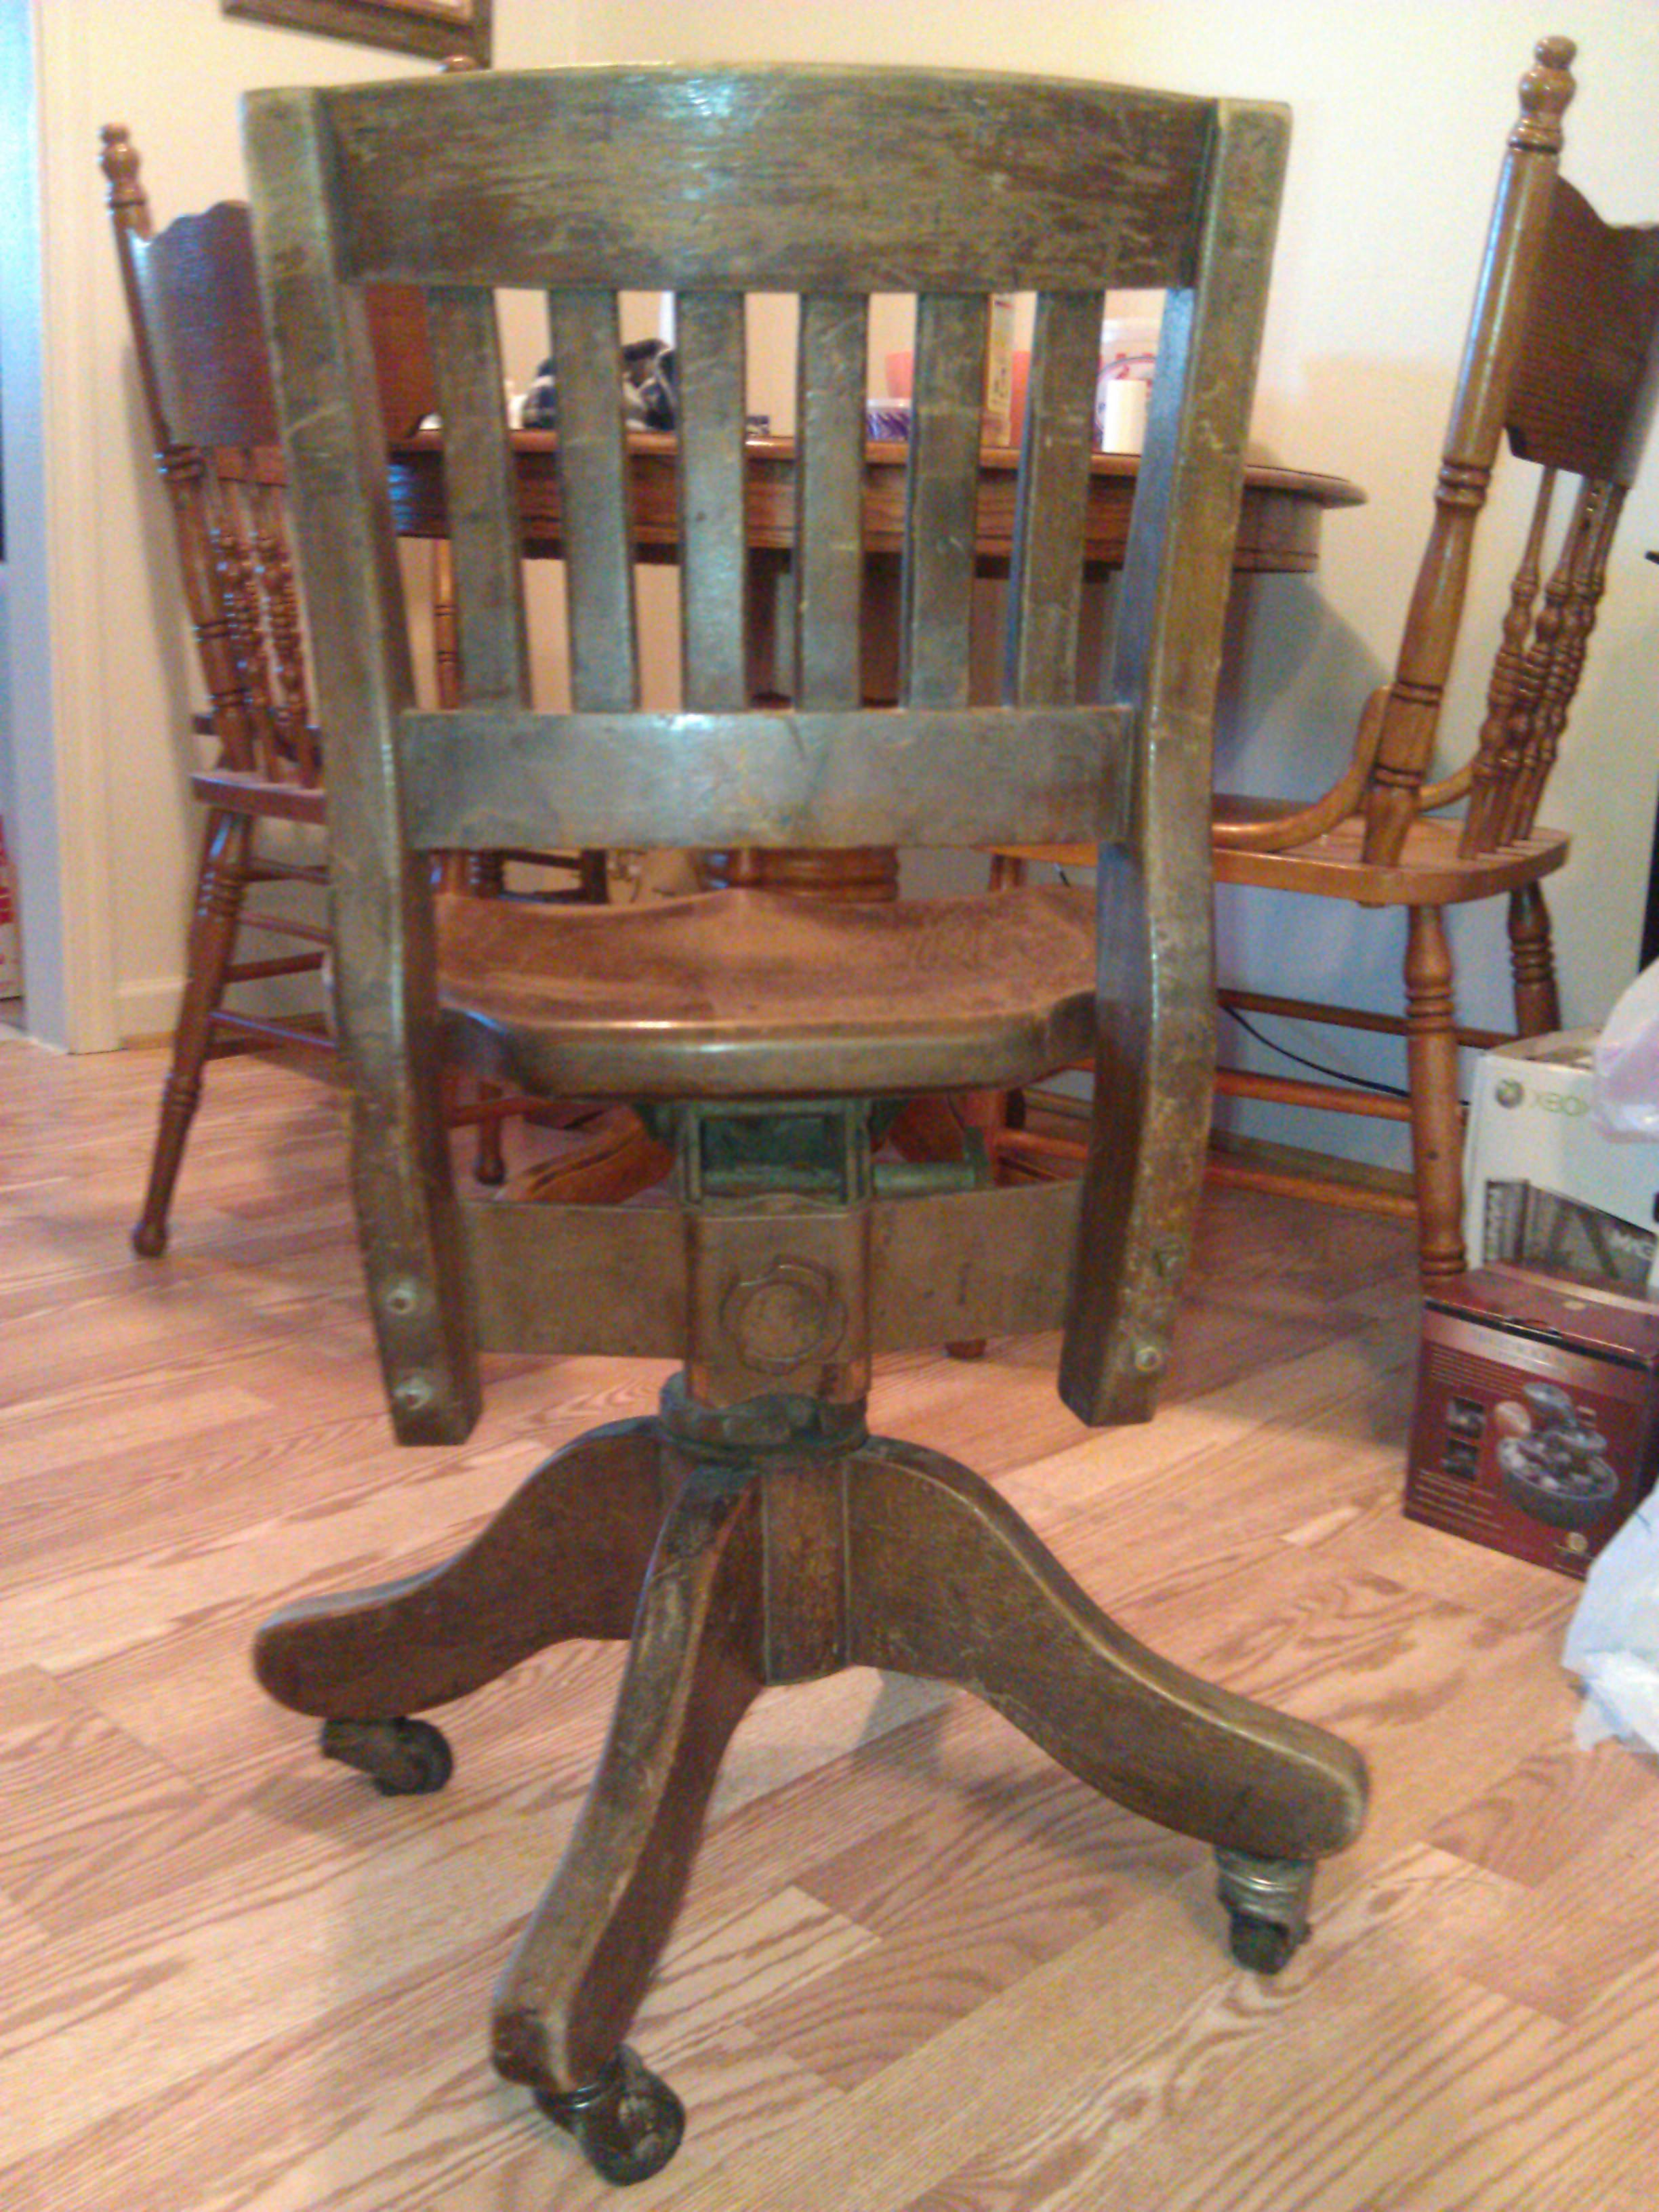 Wooden swivel desk chair antique appraisal  InstAppraisal